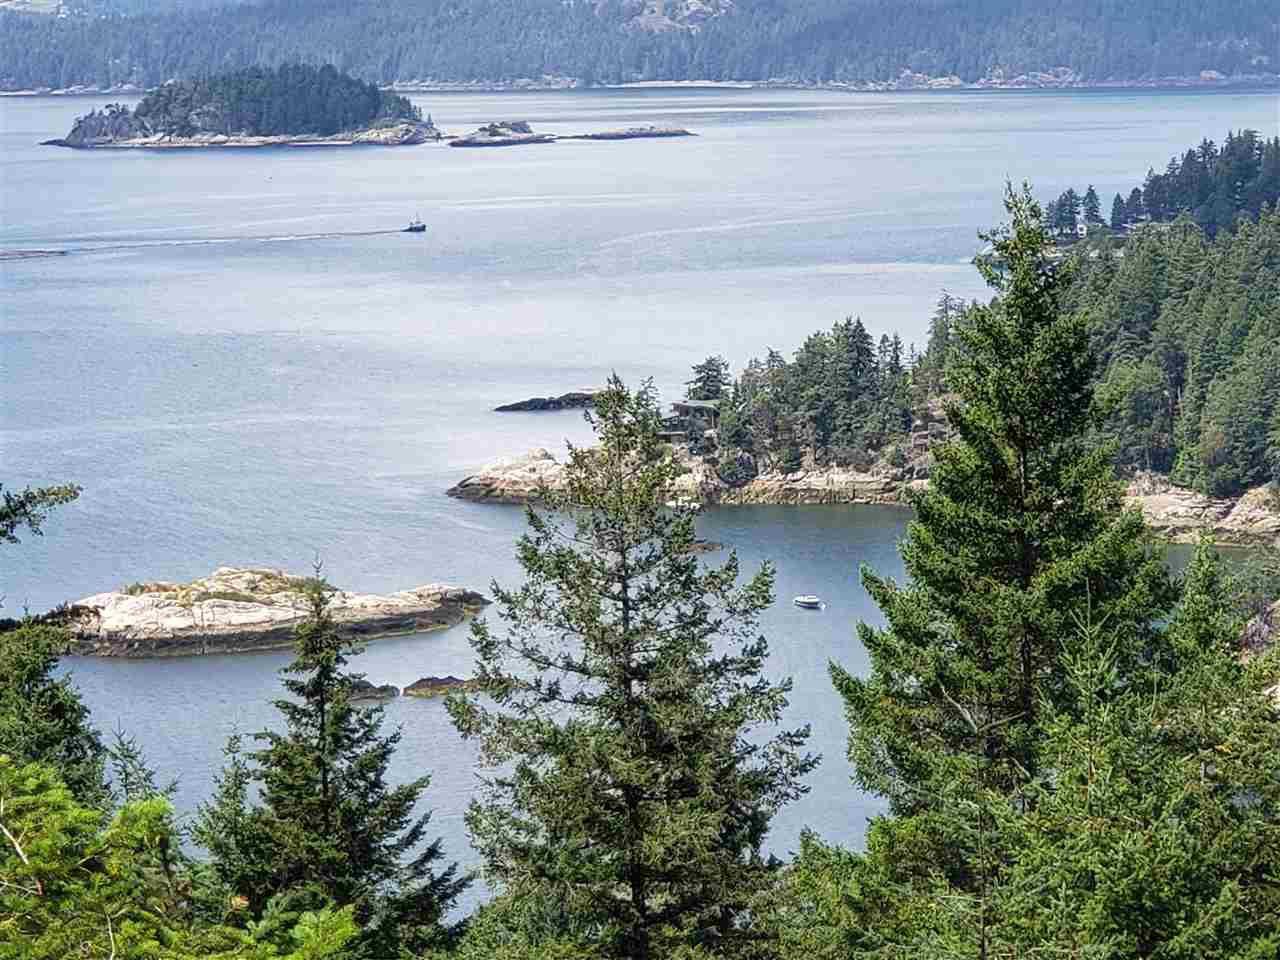 Main Photo: 1685 WHITE SAILS Drive: Bowen Island House for sale : MLS®# R2482164